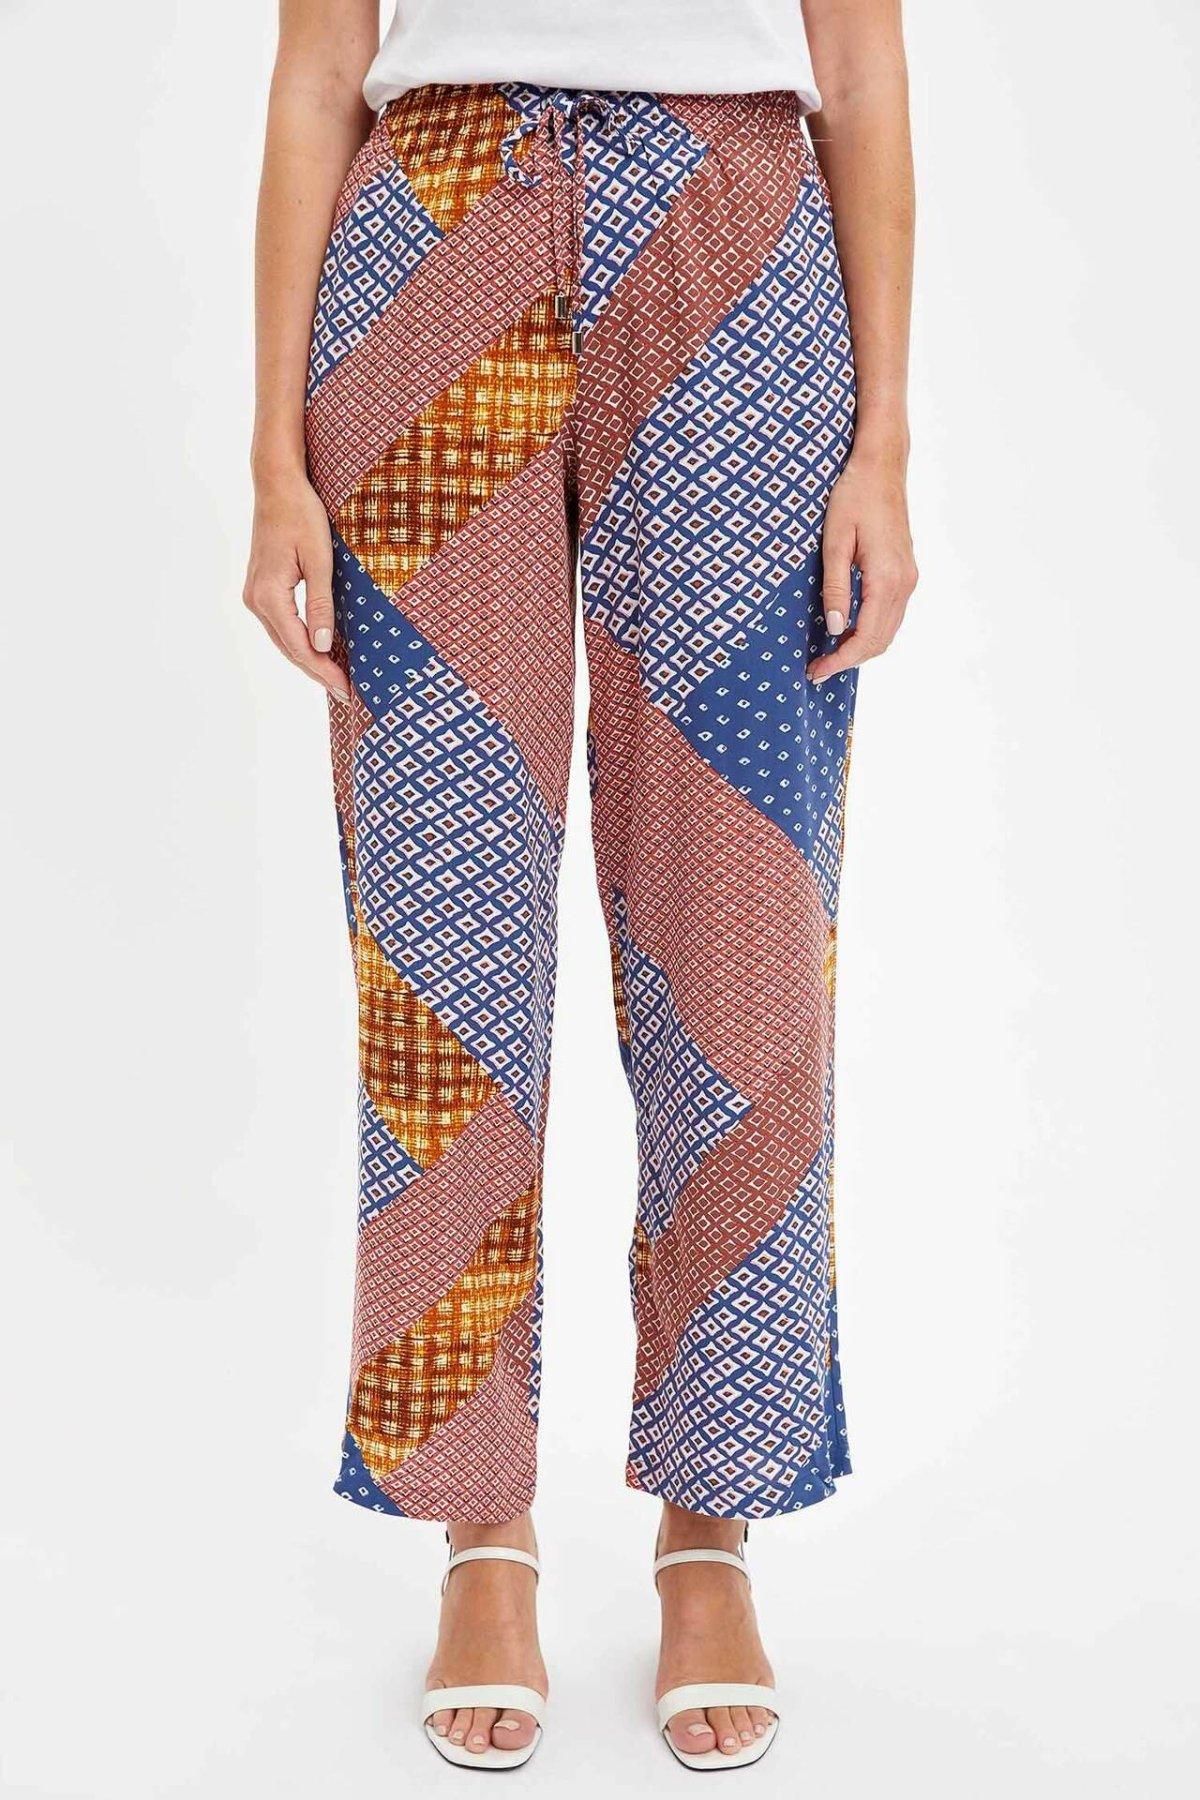 DeFacto Trendy Women Wide Leg Long Pants Black White Stripe Loose Pant Woven Elastic Bottom Casual Trousers-K0173AZ19SP